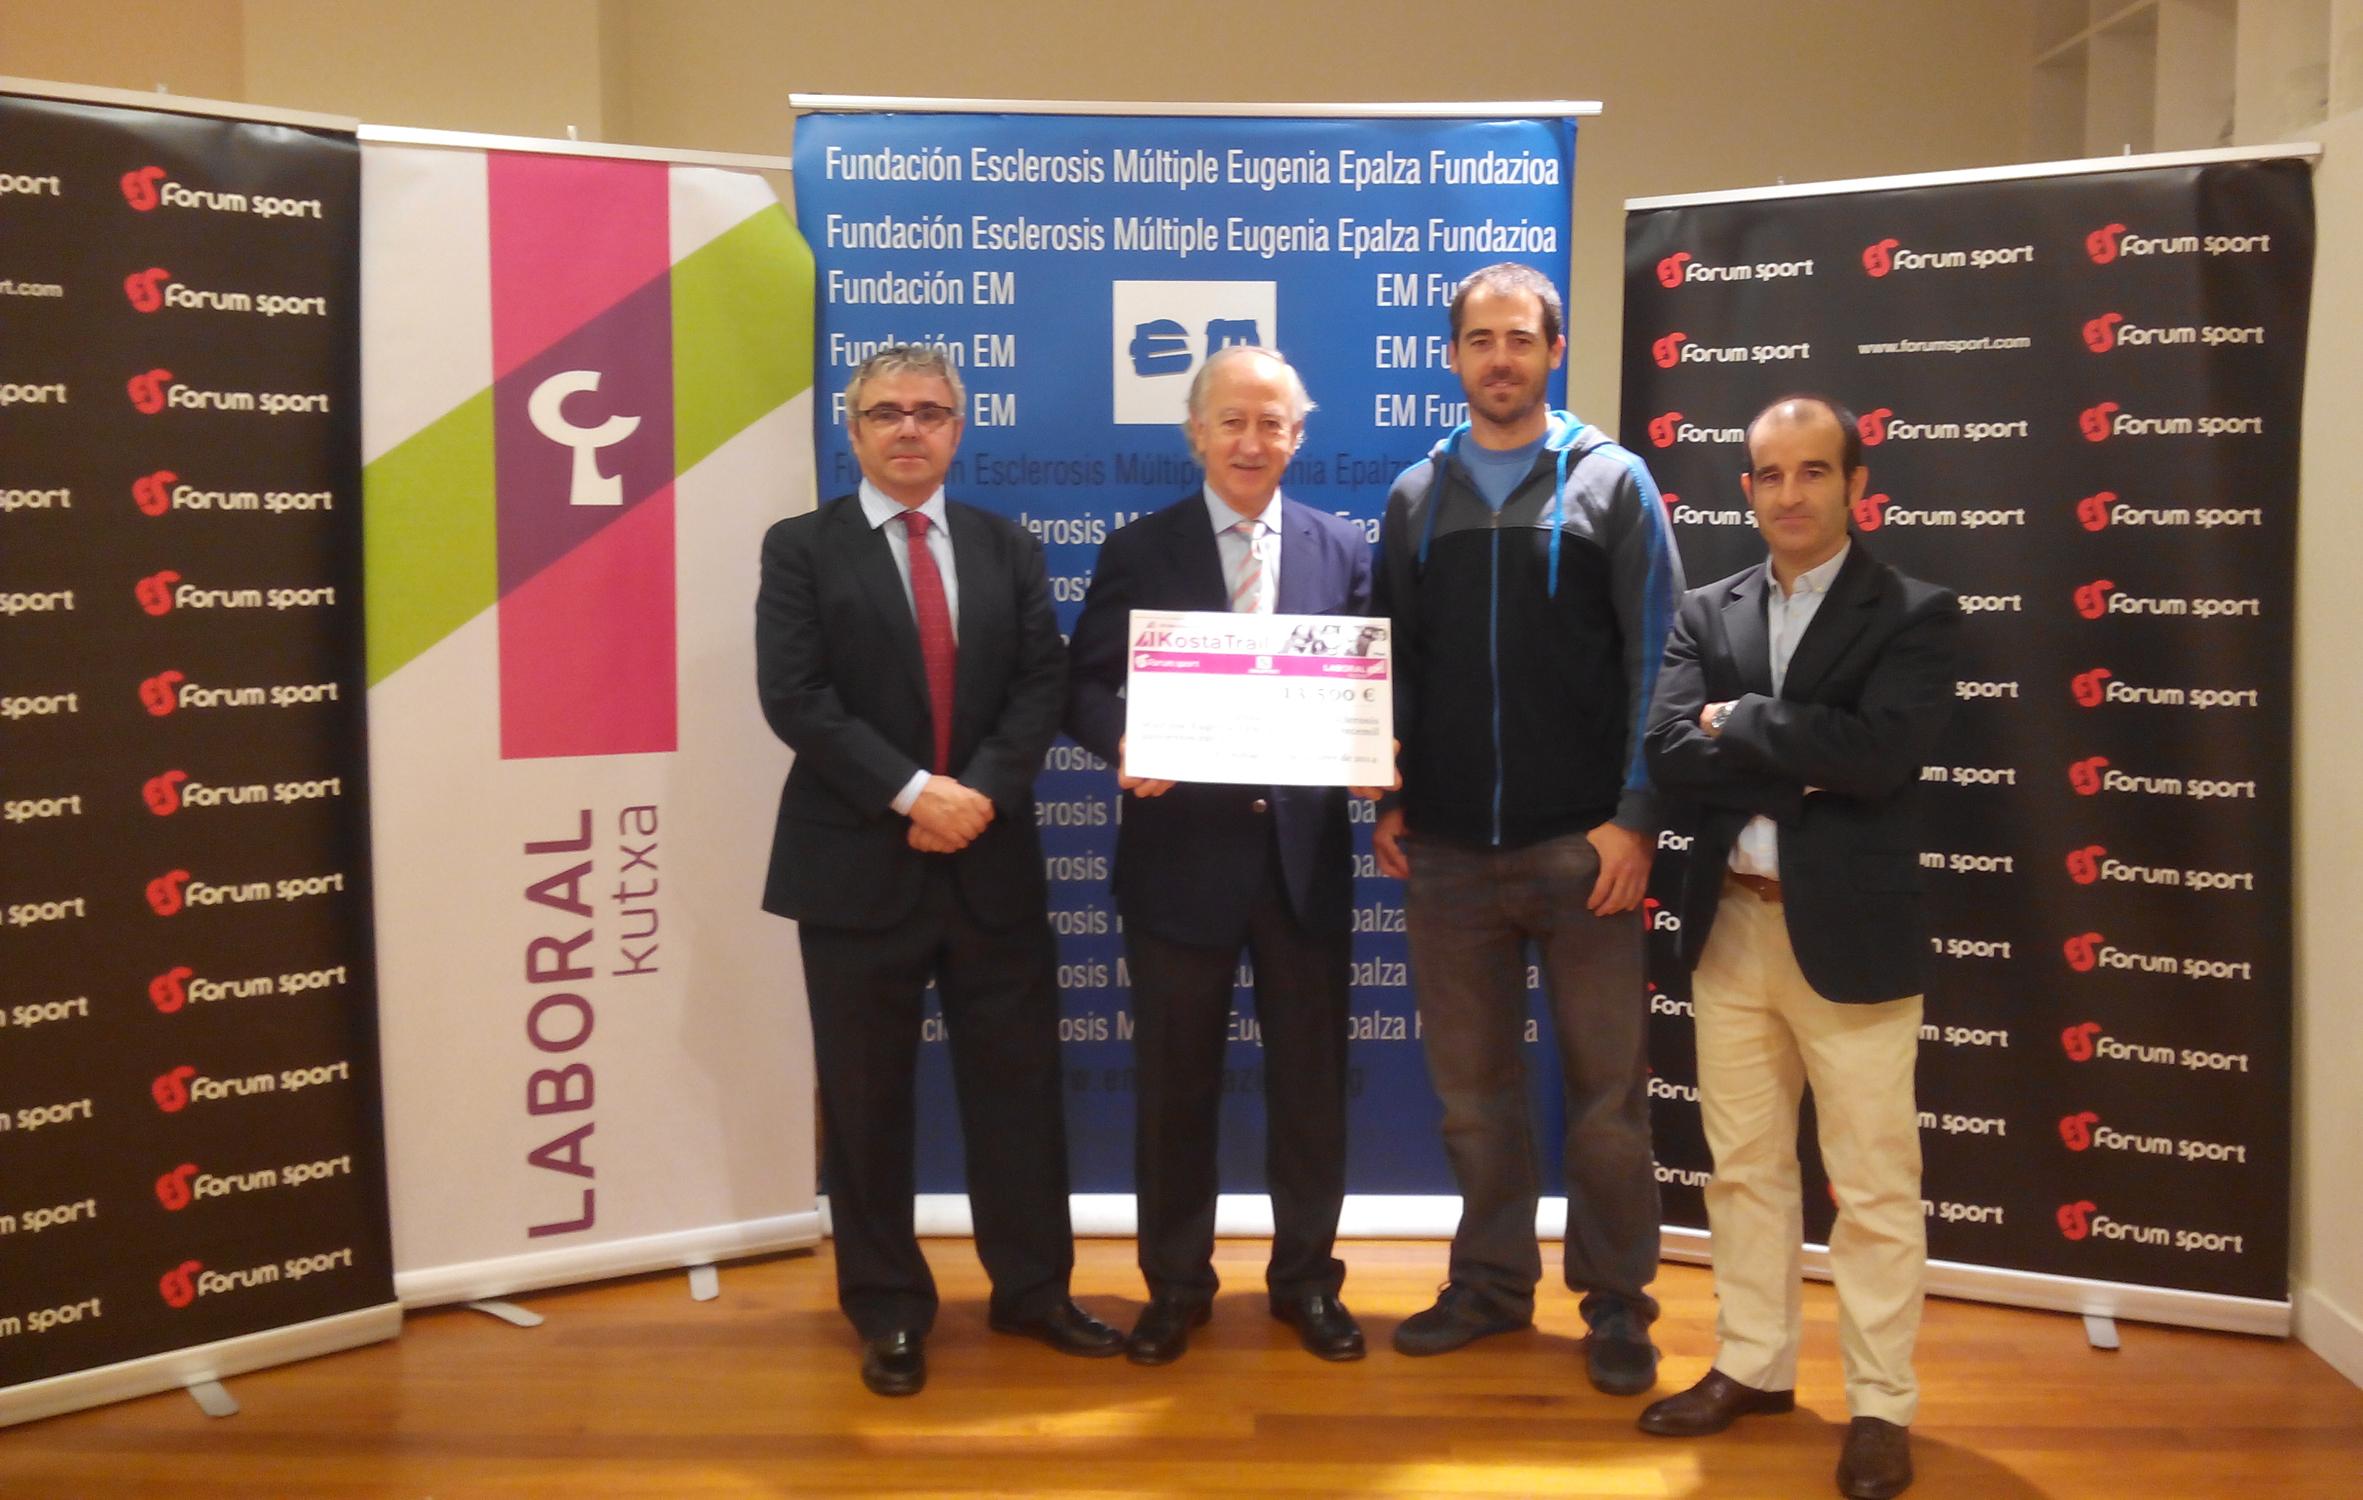 La 09. Kosta Trail recauda 13.500 euros para la lucha contra la esclerosis múltiple